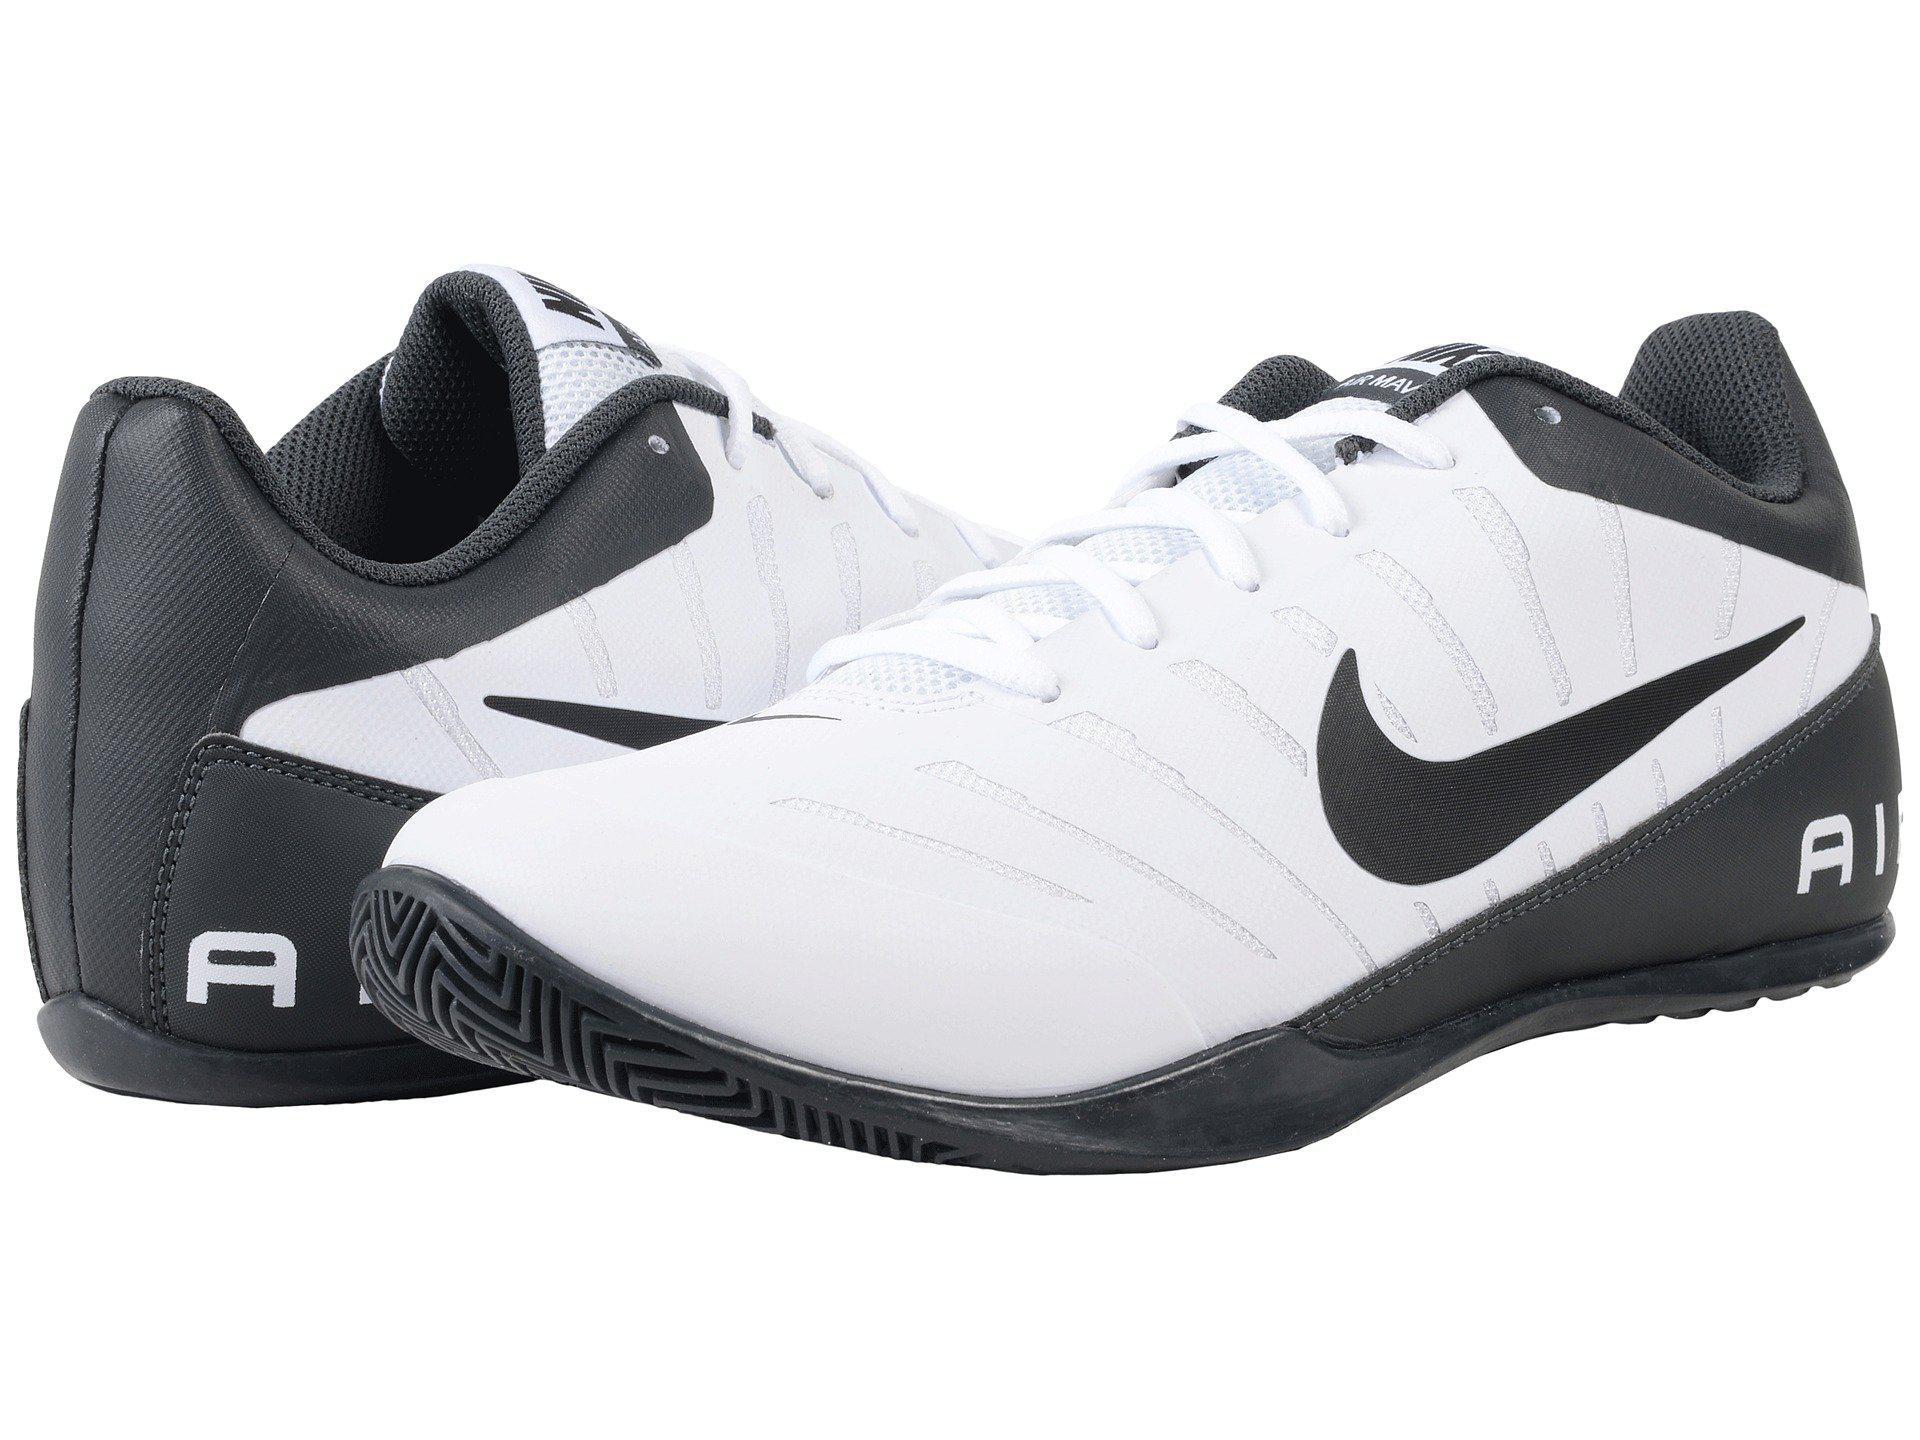 f9cdb21a192 Lyst - Nike Air Mavin Low 2 in White for Men